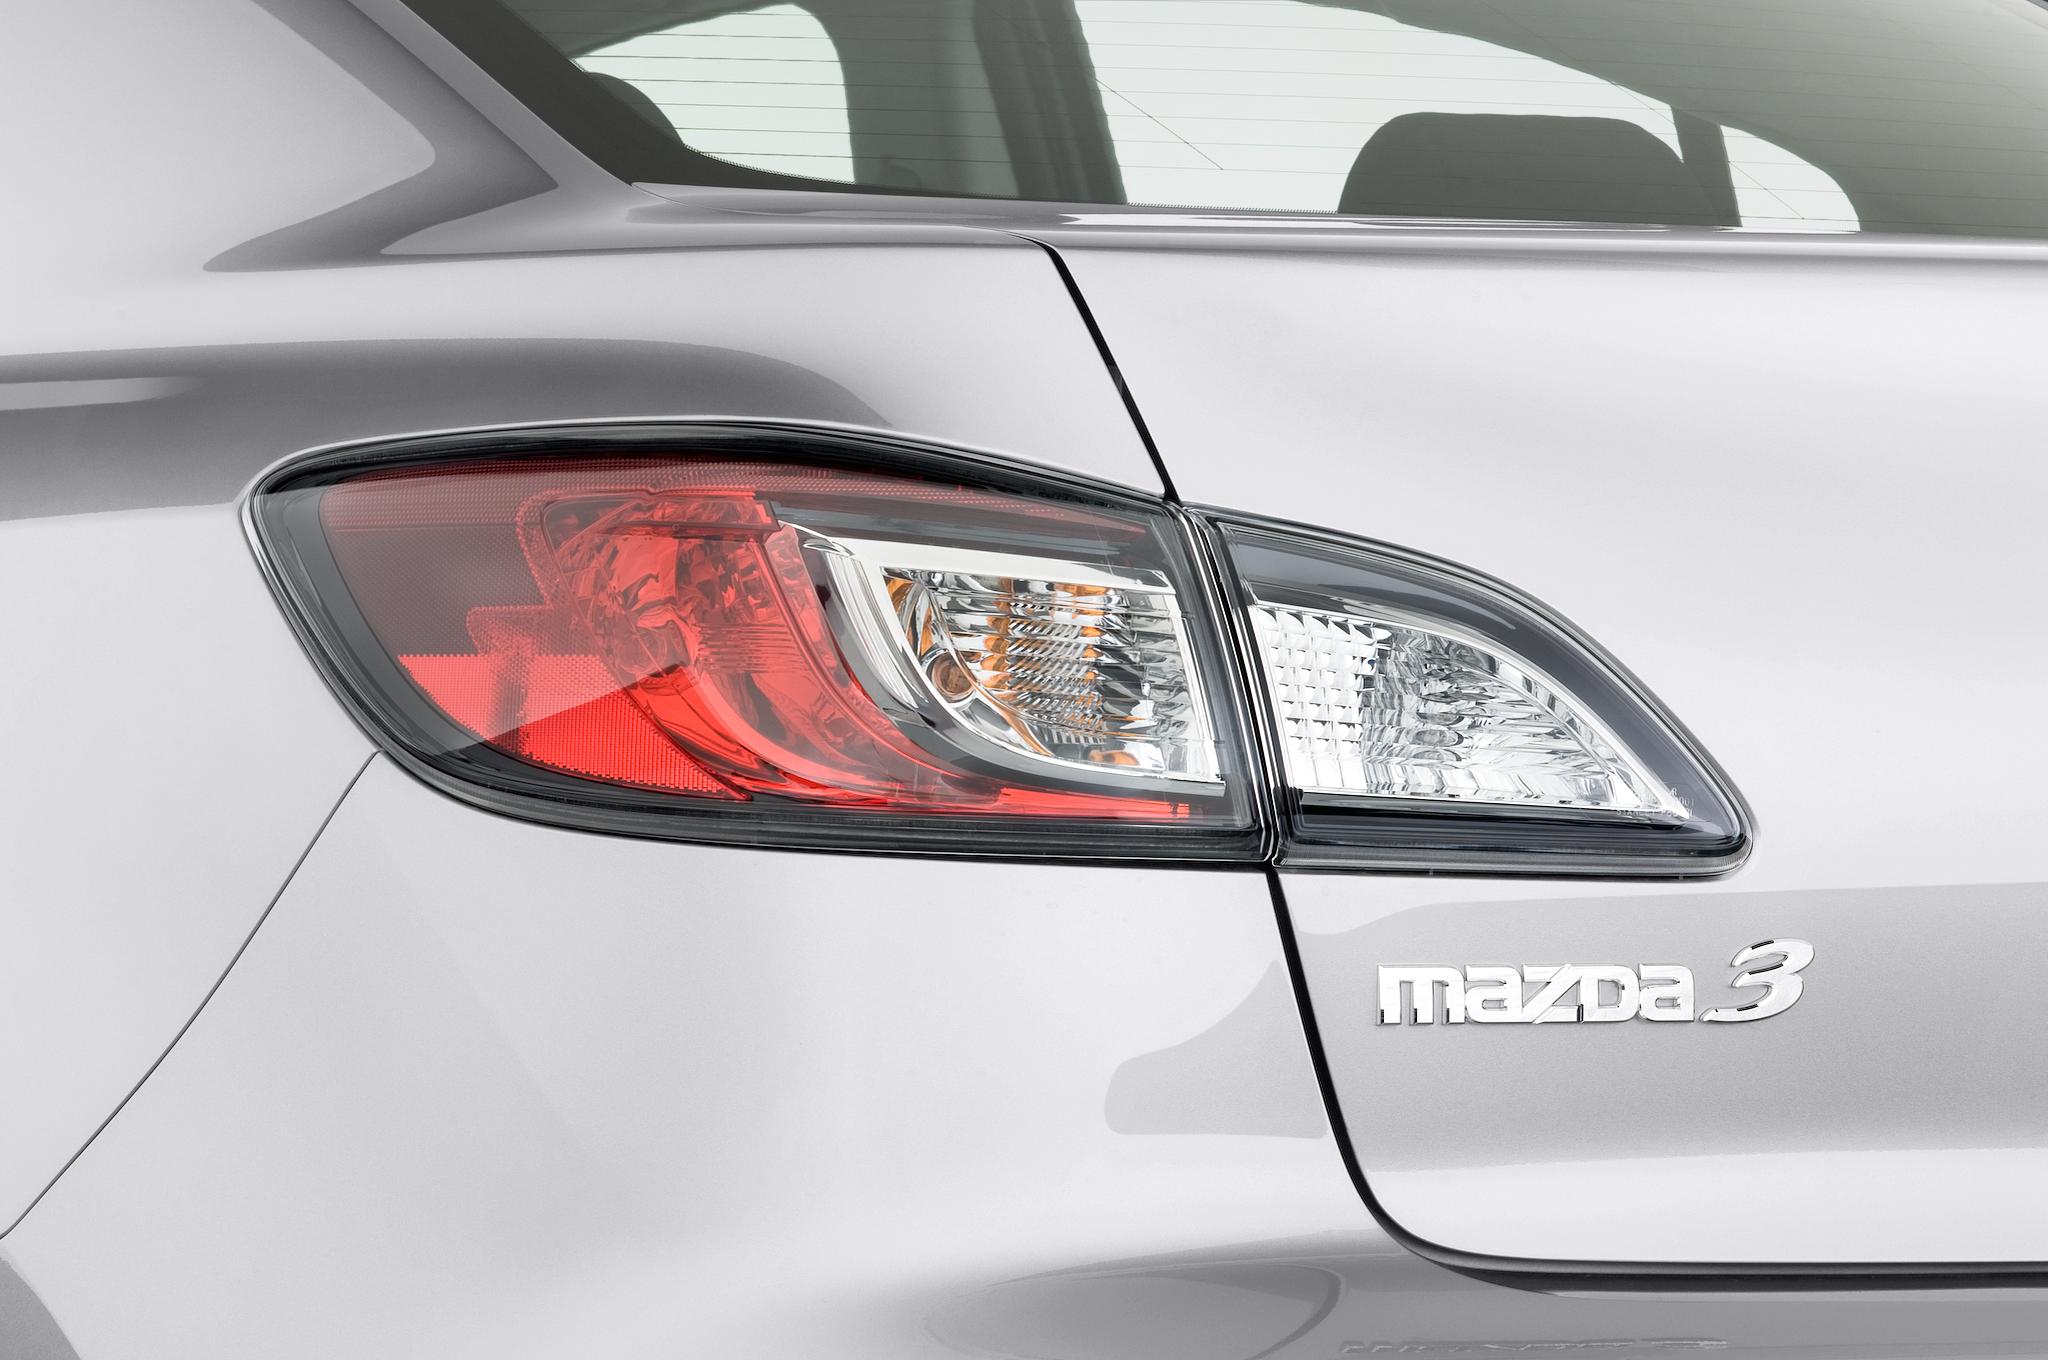 http://st.automobilemag.com/uploads/sites/10/2015/11/2010-mazda-mazda3-i-sport-4-door-sedan-taillight.png